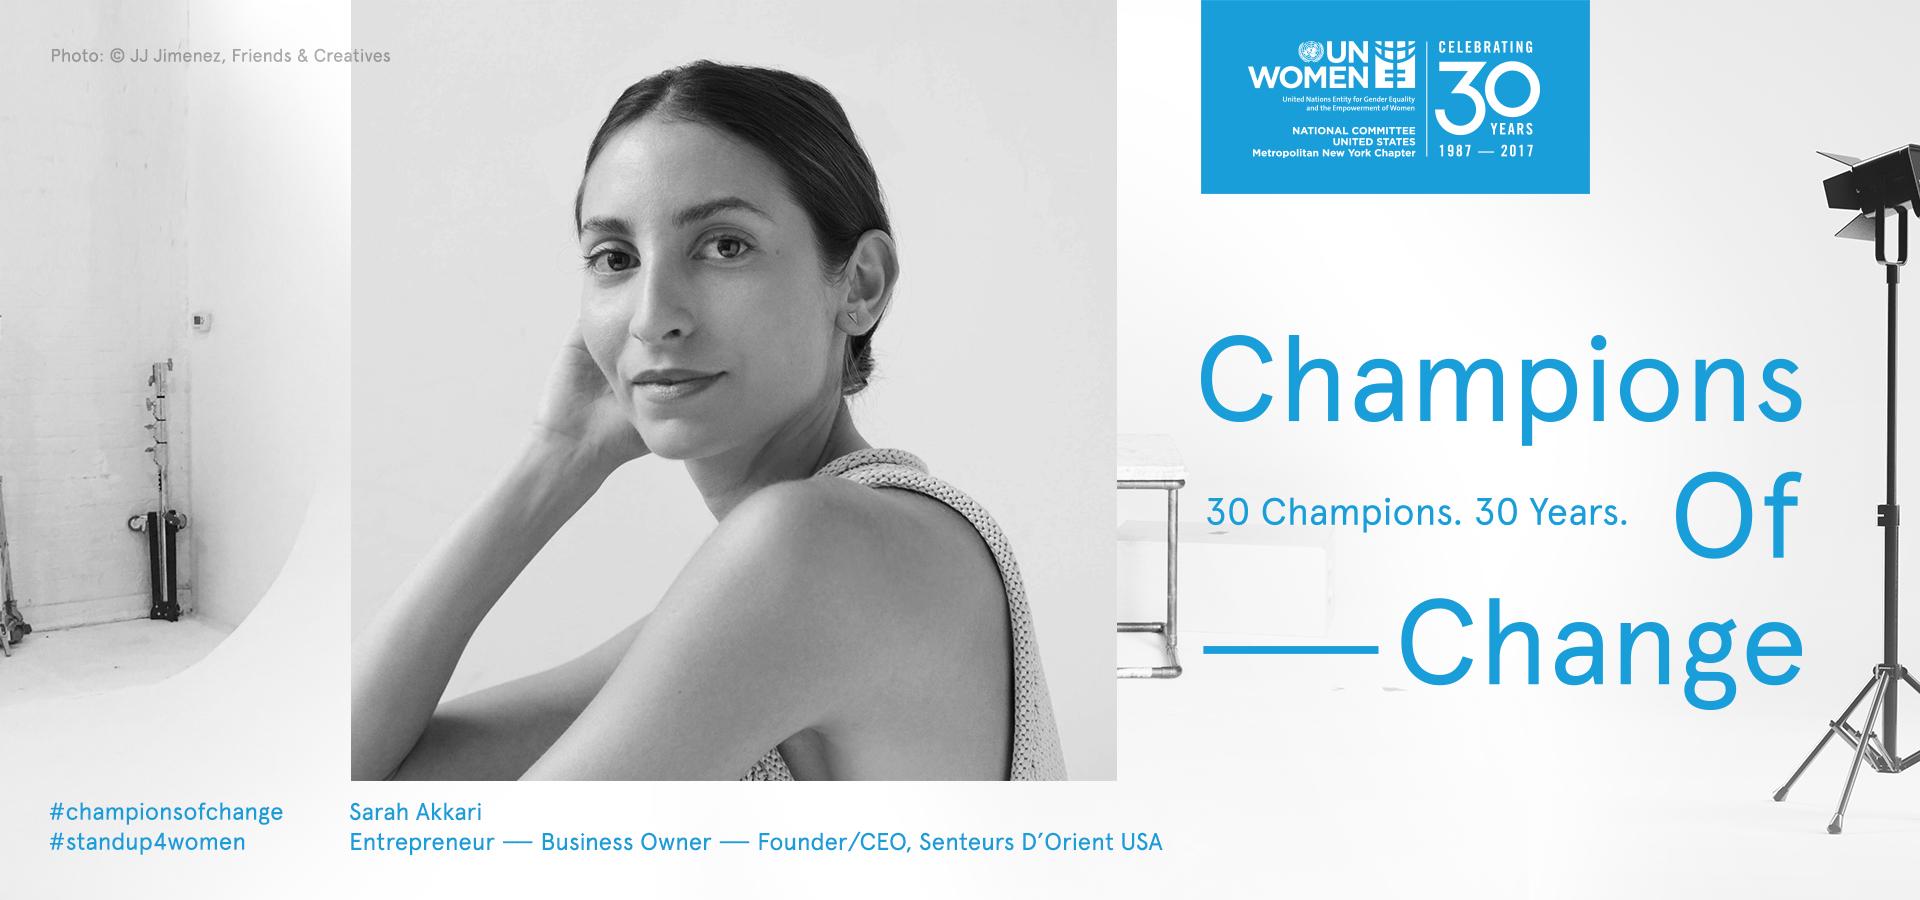 2018_UNWomen_ChampionsOfChange_Website_ProfilePage_SarahAkkari.jpg